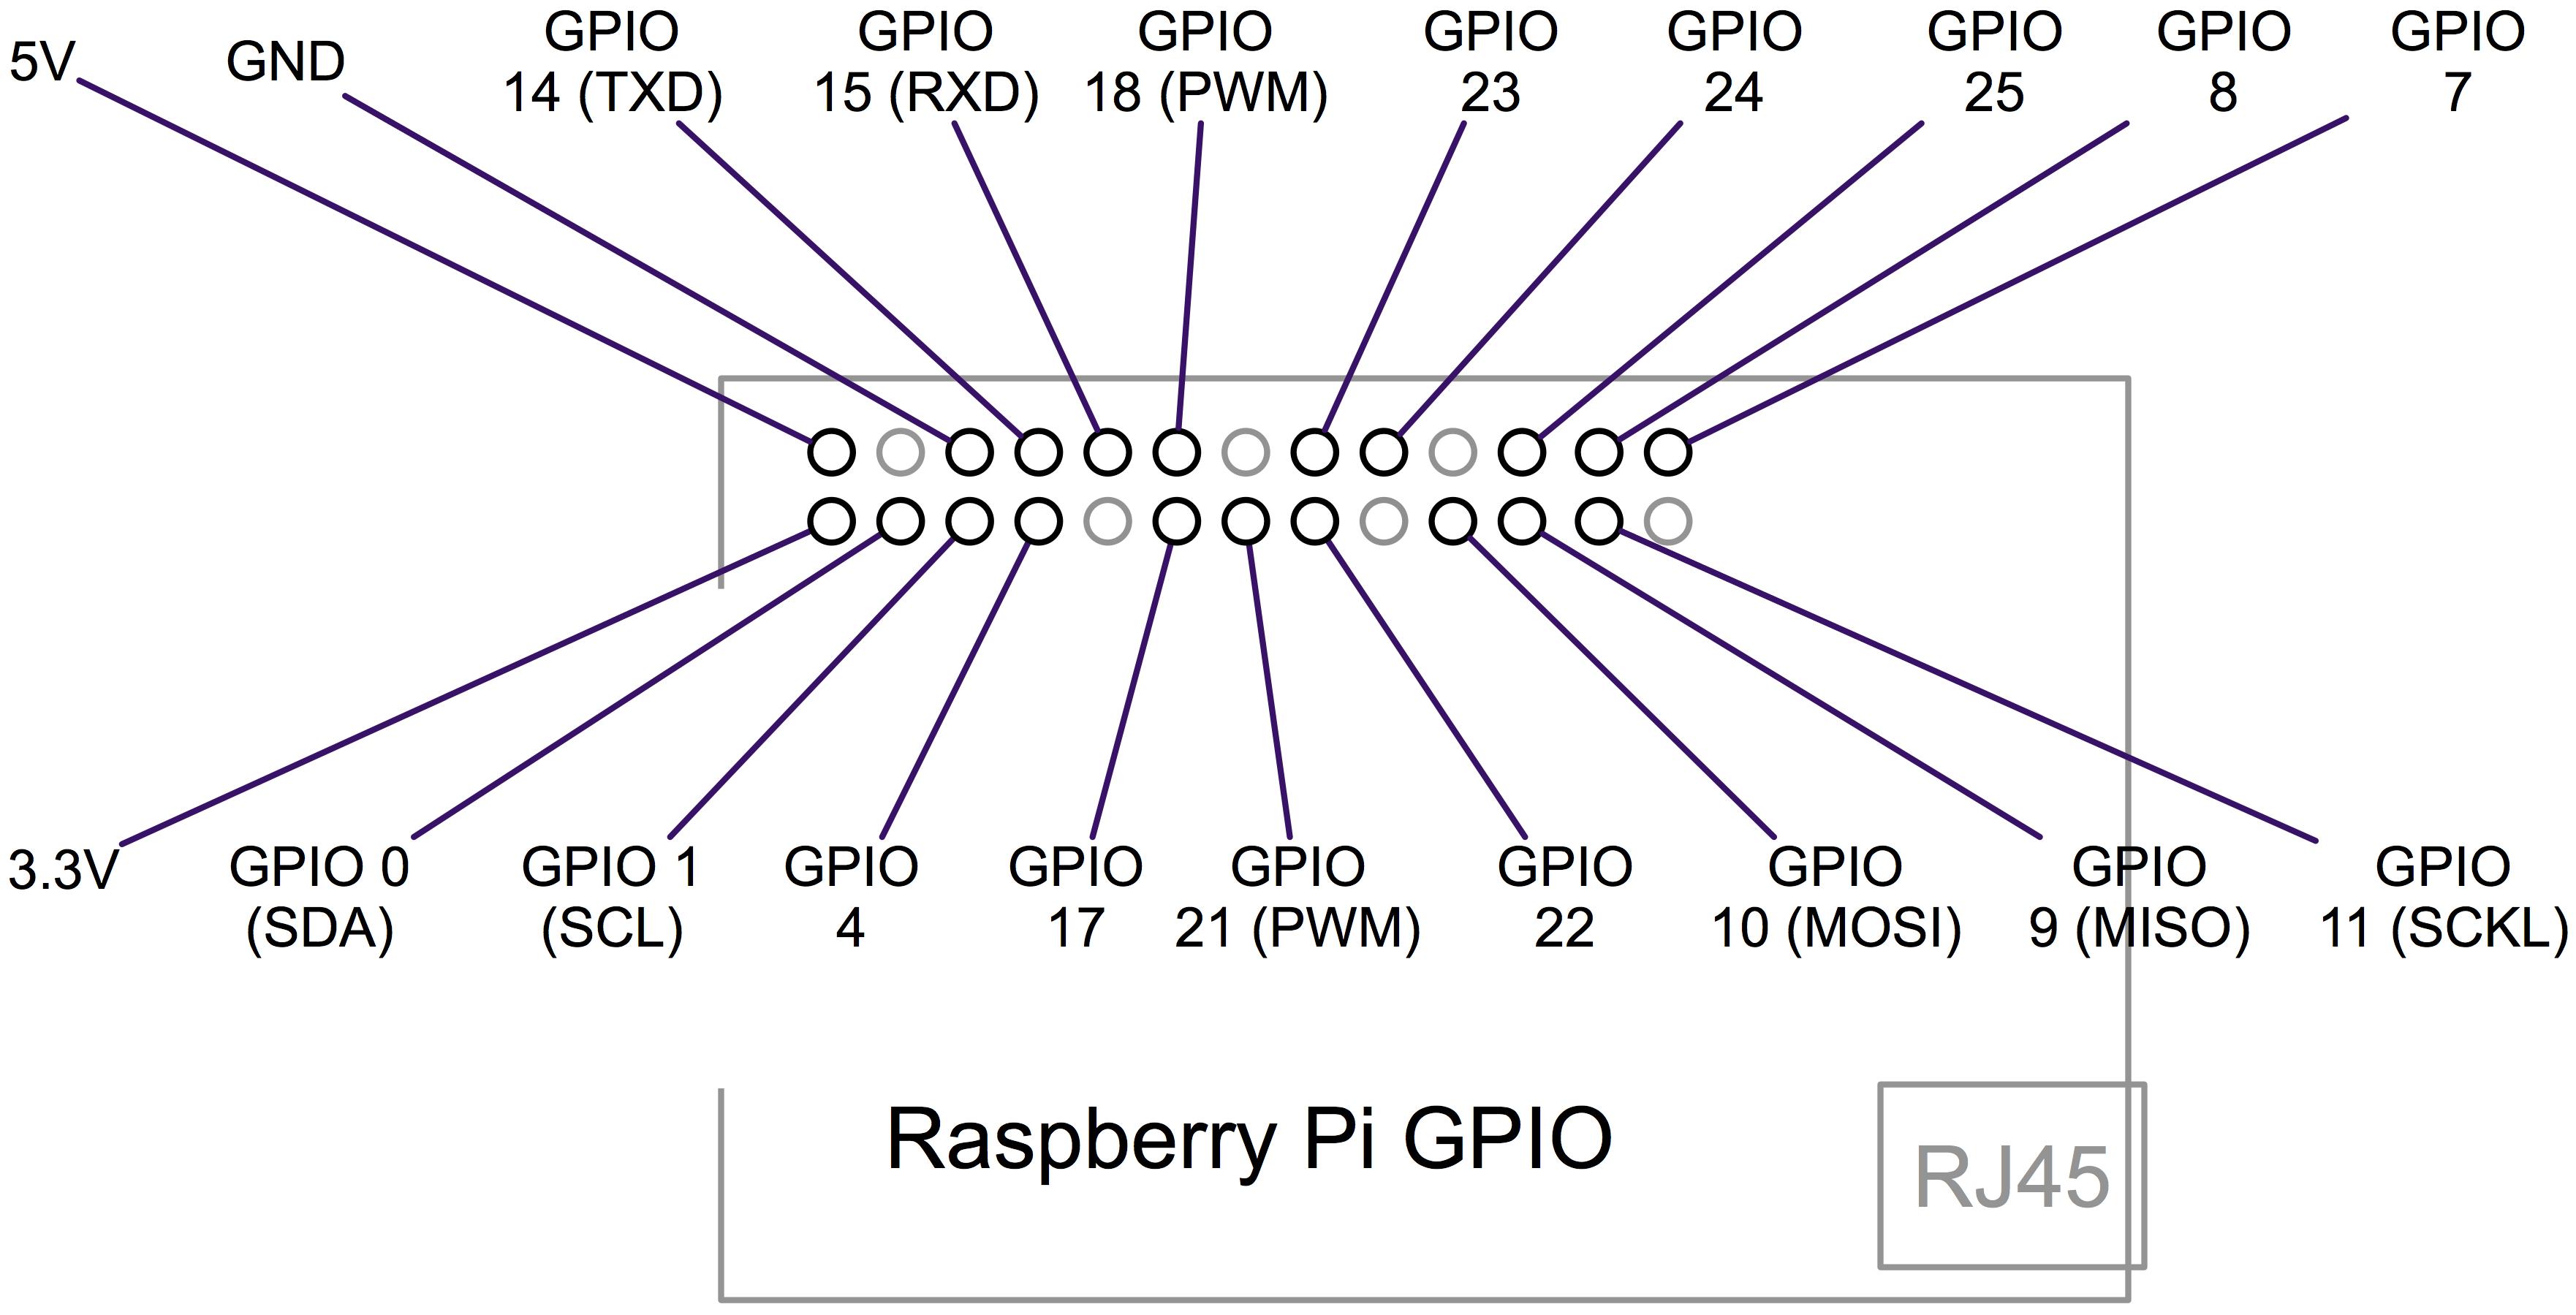 learn_raspberry_pi_gpio-srm.png